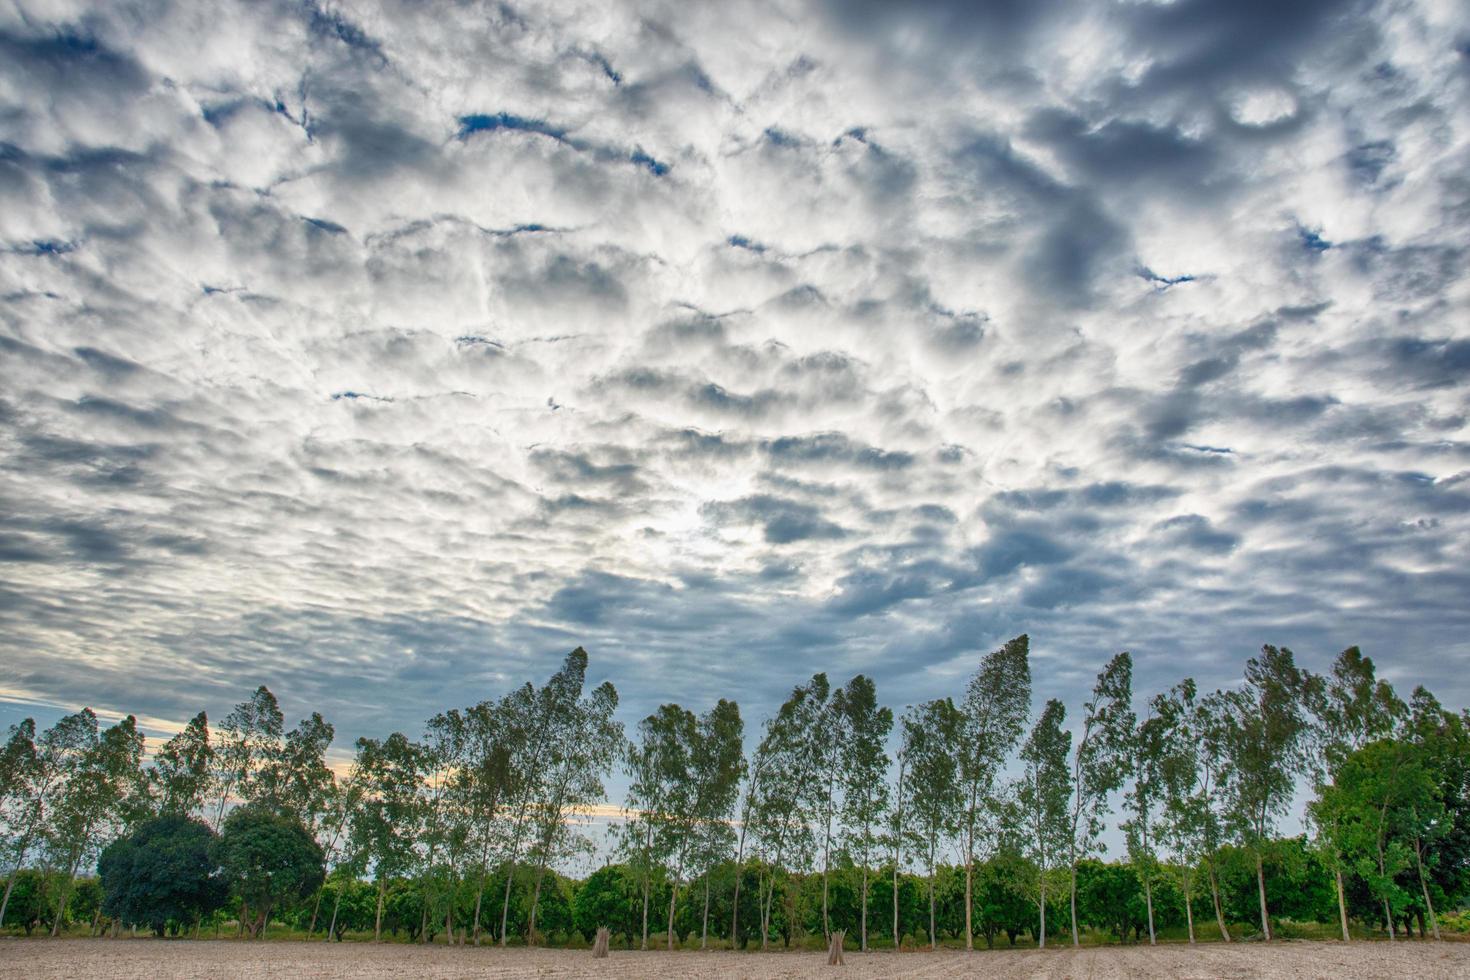 bomen onder dramatische hemel foto